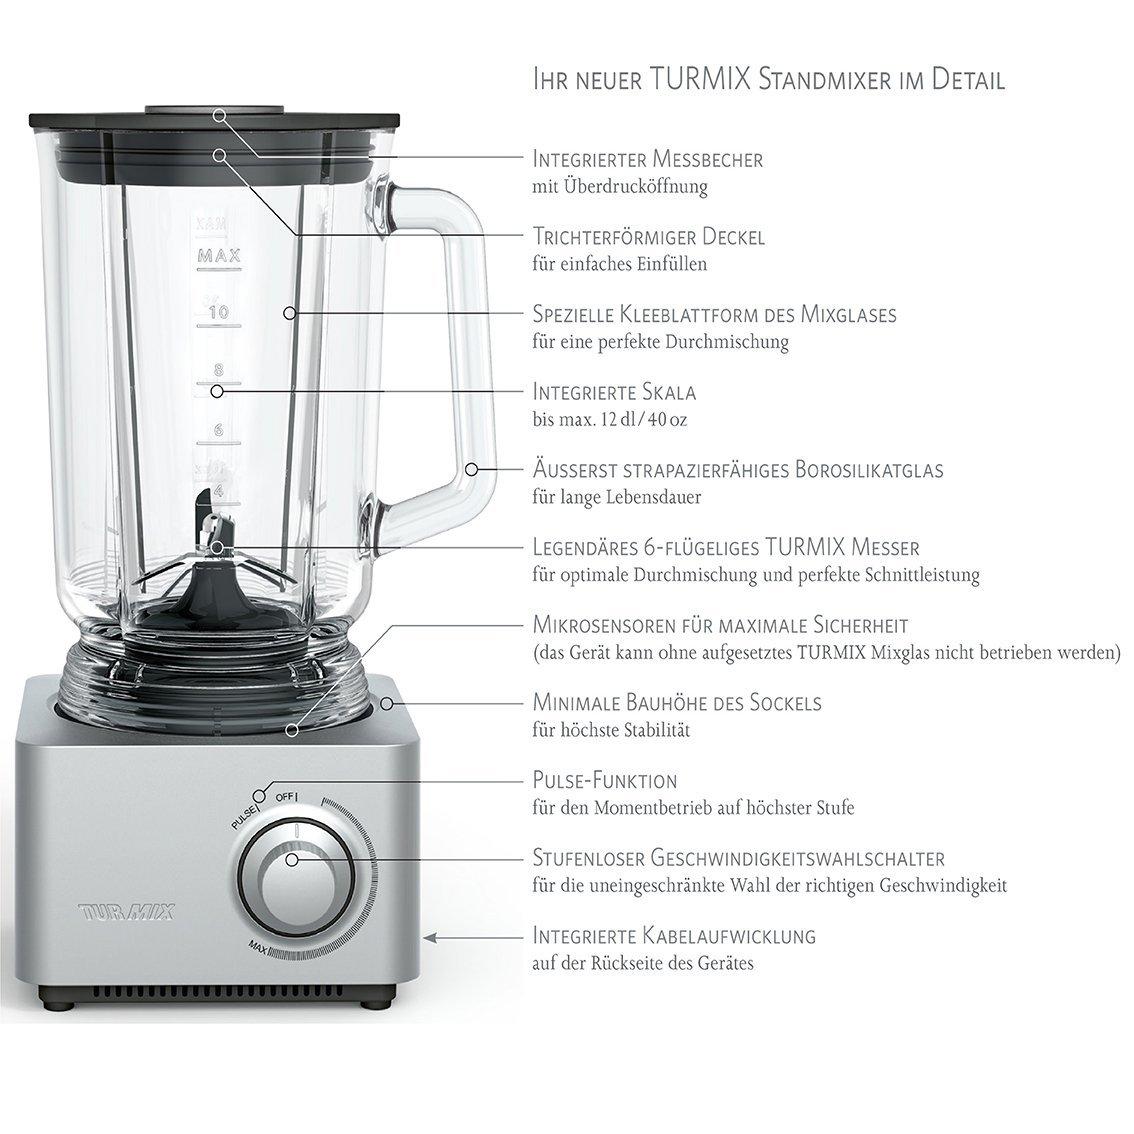 Turmix TM33141 Batidora de vaso 450W Negro, Plata, Transparente - Licuadora (9000 RPM, 15000 RPM, Batidora de vaso, Negro, Plata, Transparente, 1,2 m, 450 W): Amazon.es: Hogar